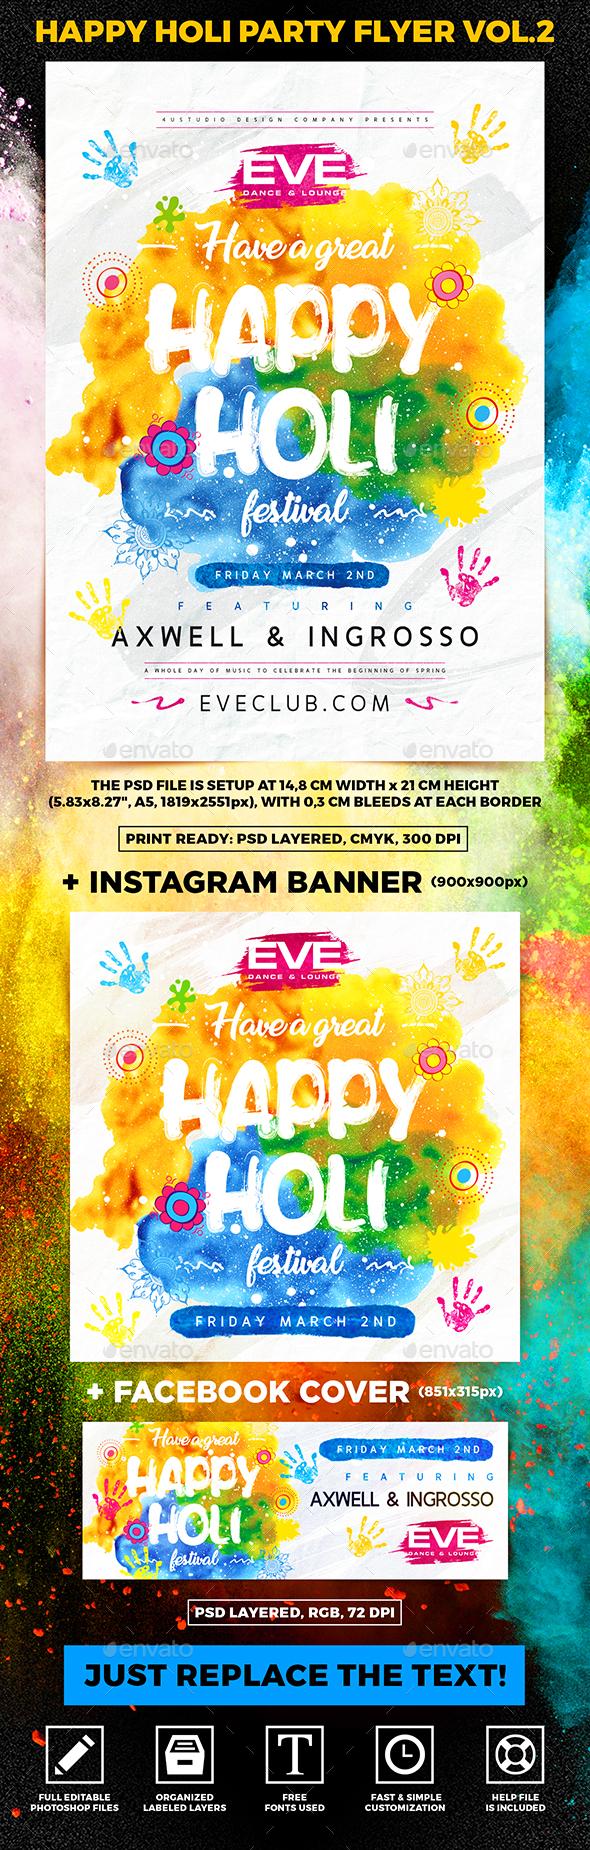 Happy Holi Party Flyer vol.2 - Holidays Events